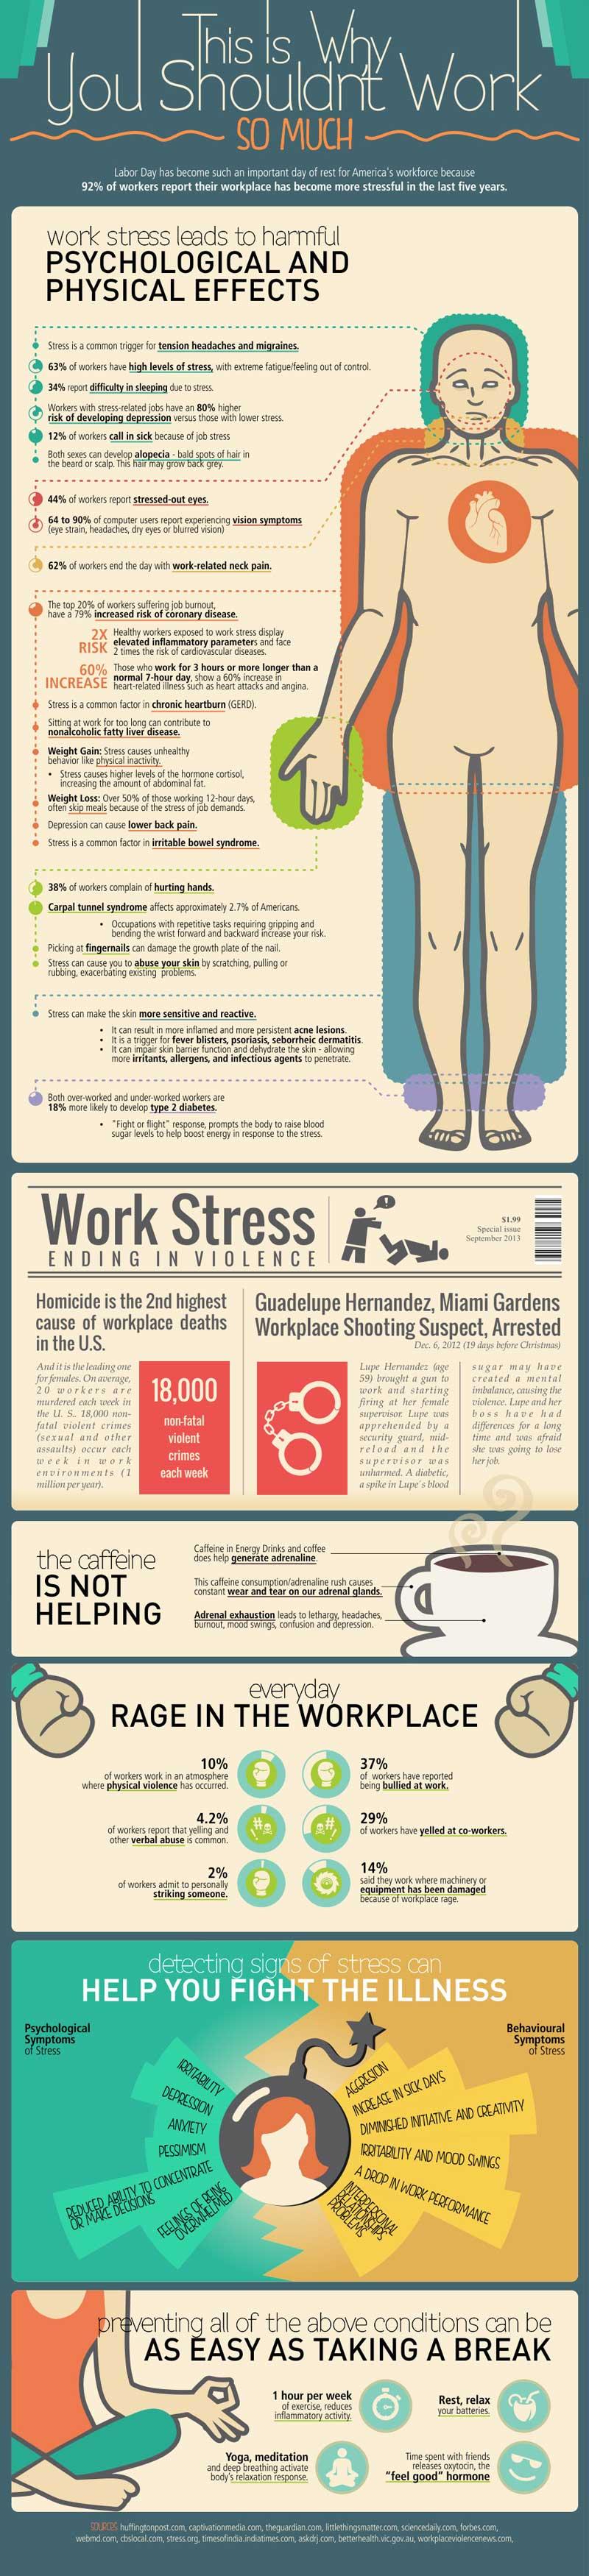 stress-physical-damage